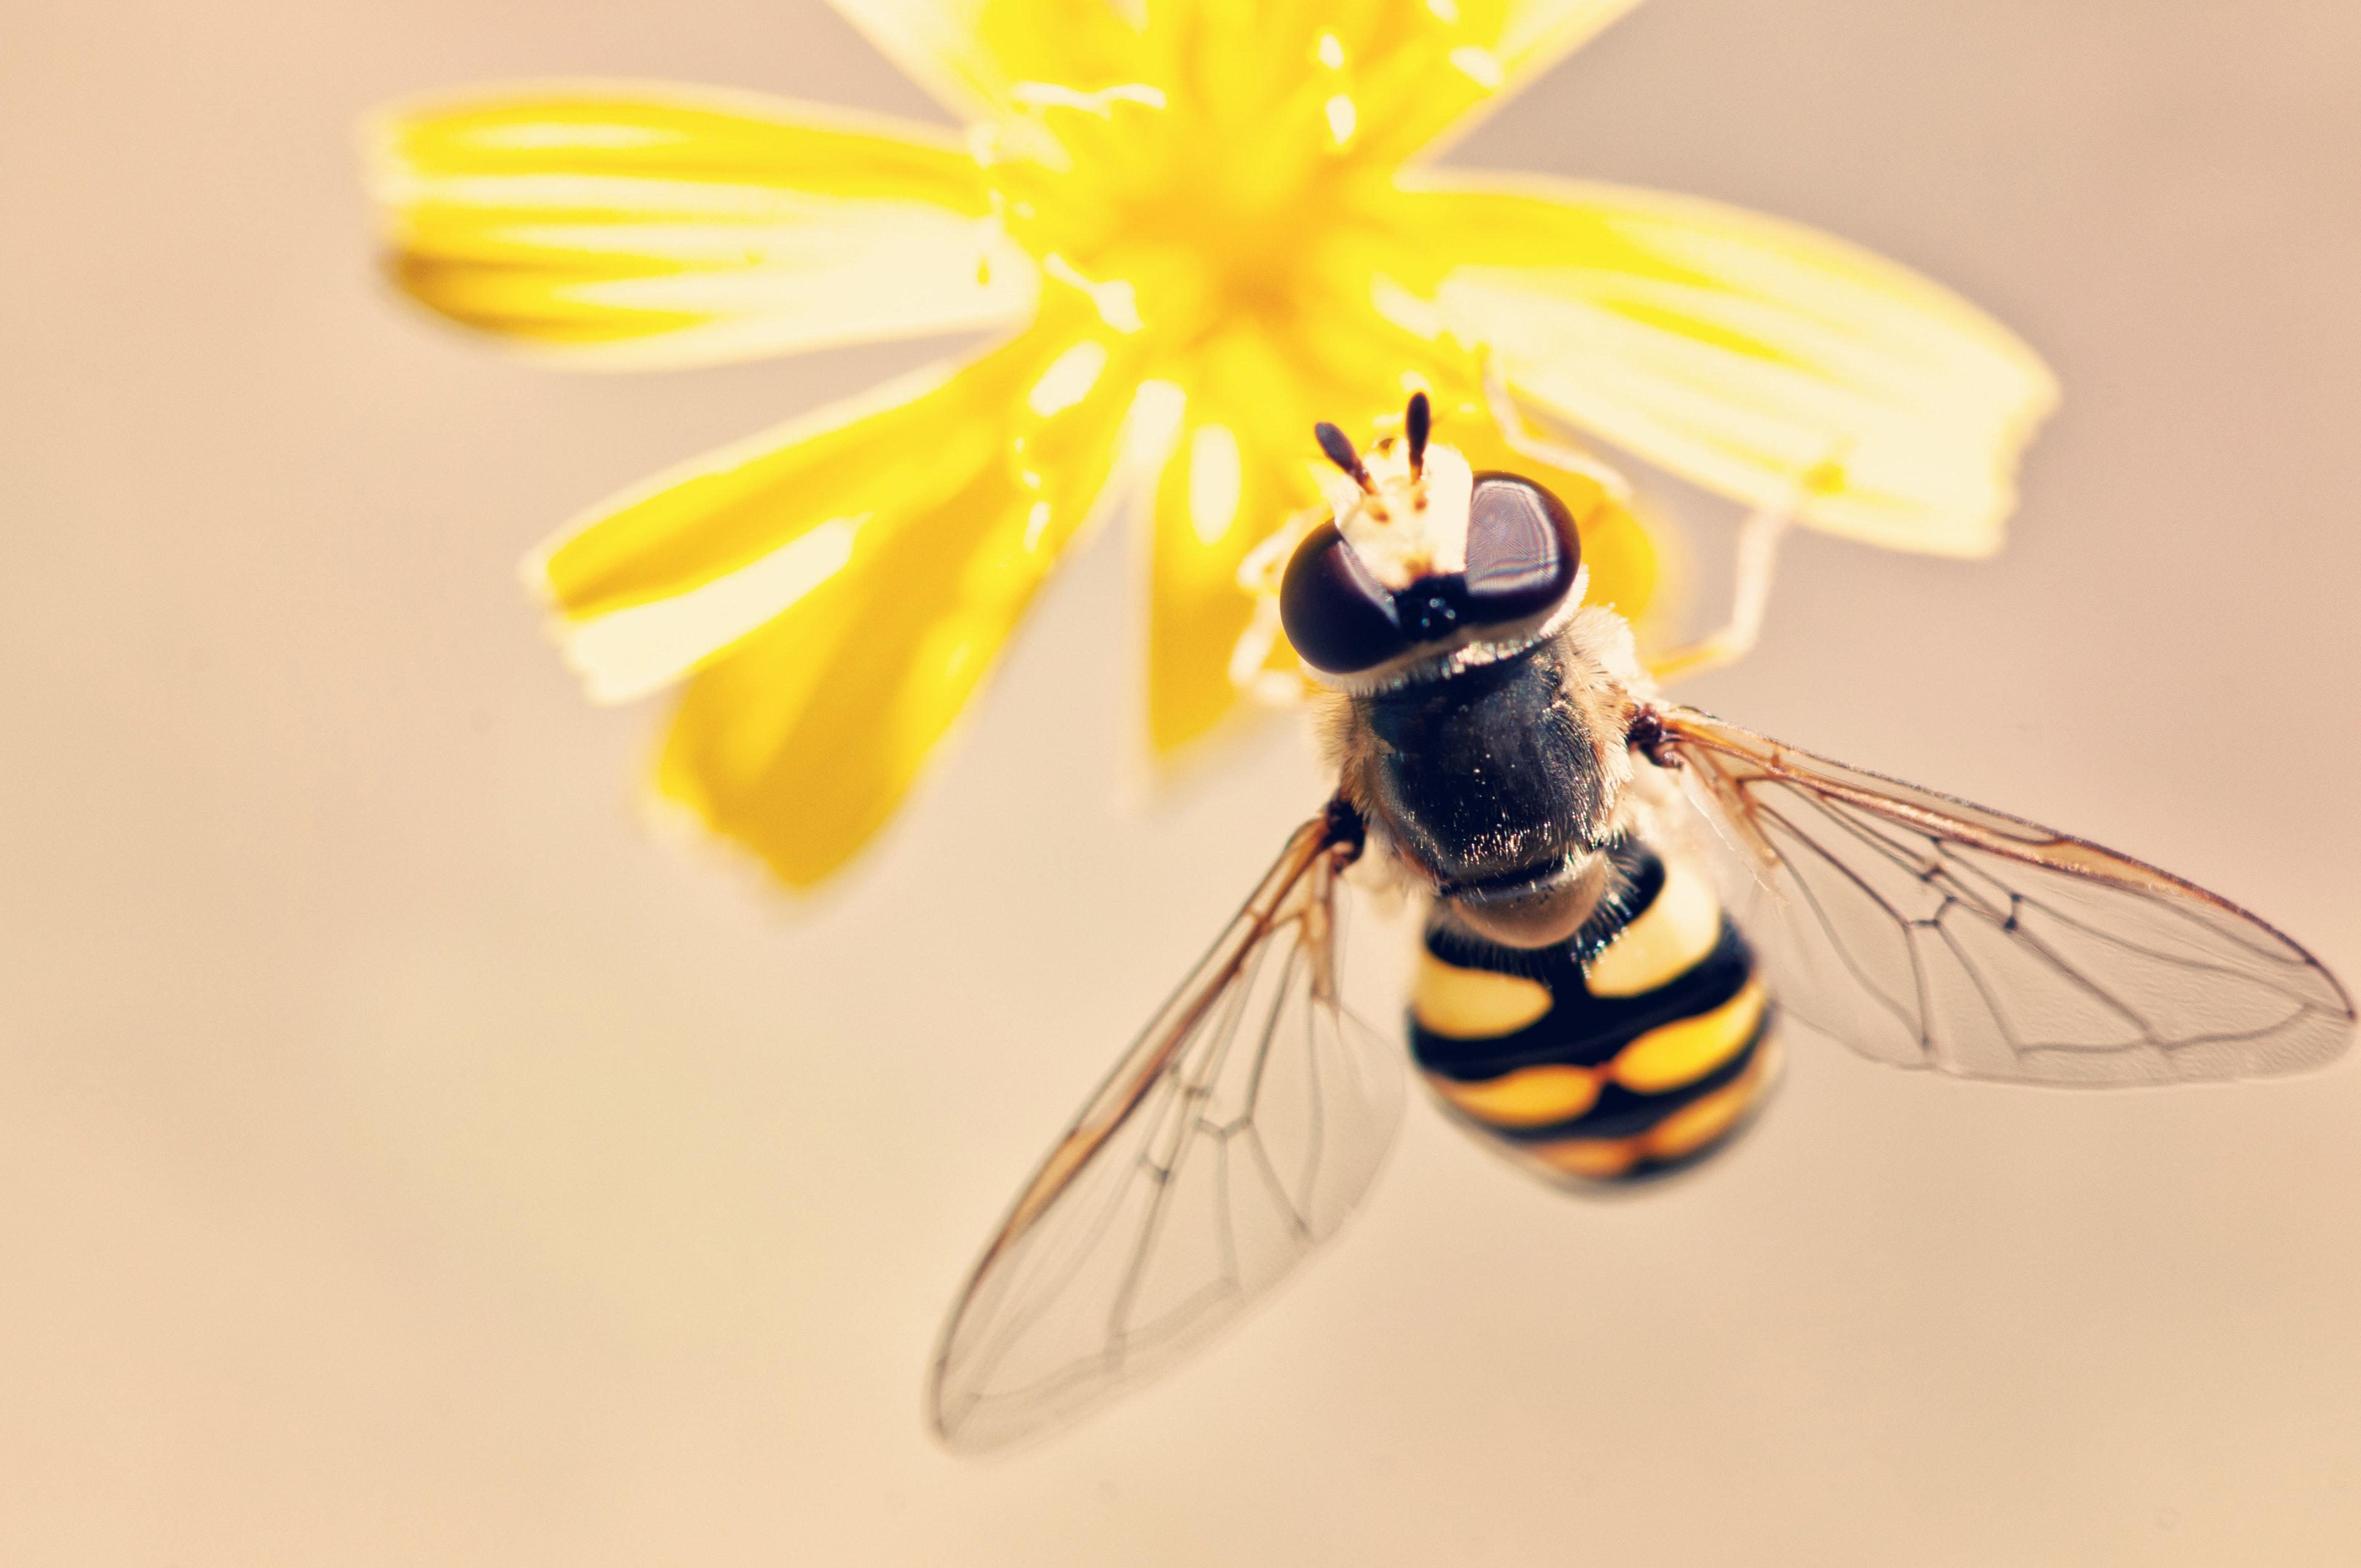 antenna-bee-bloom-395241